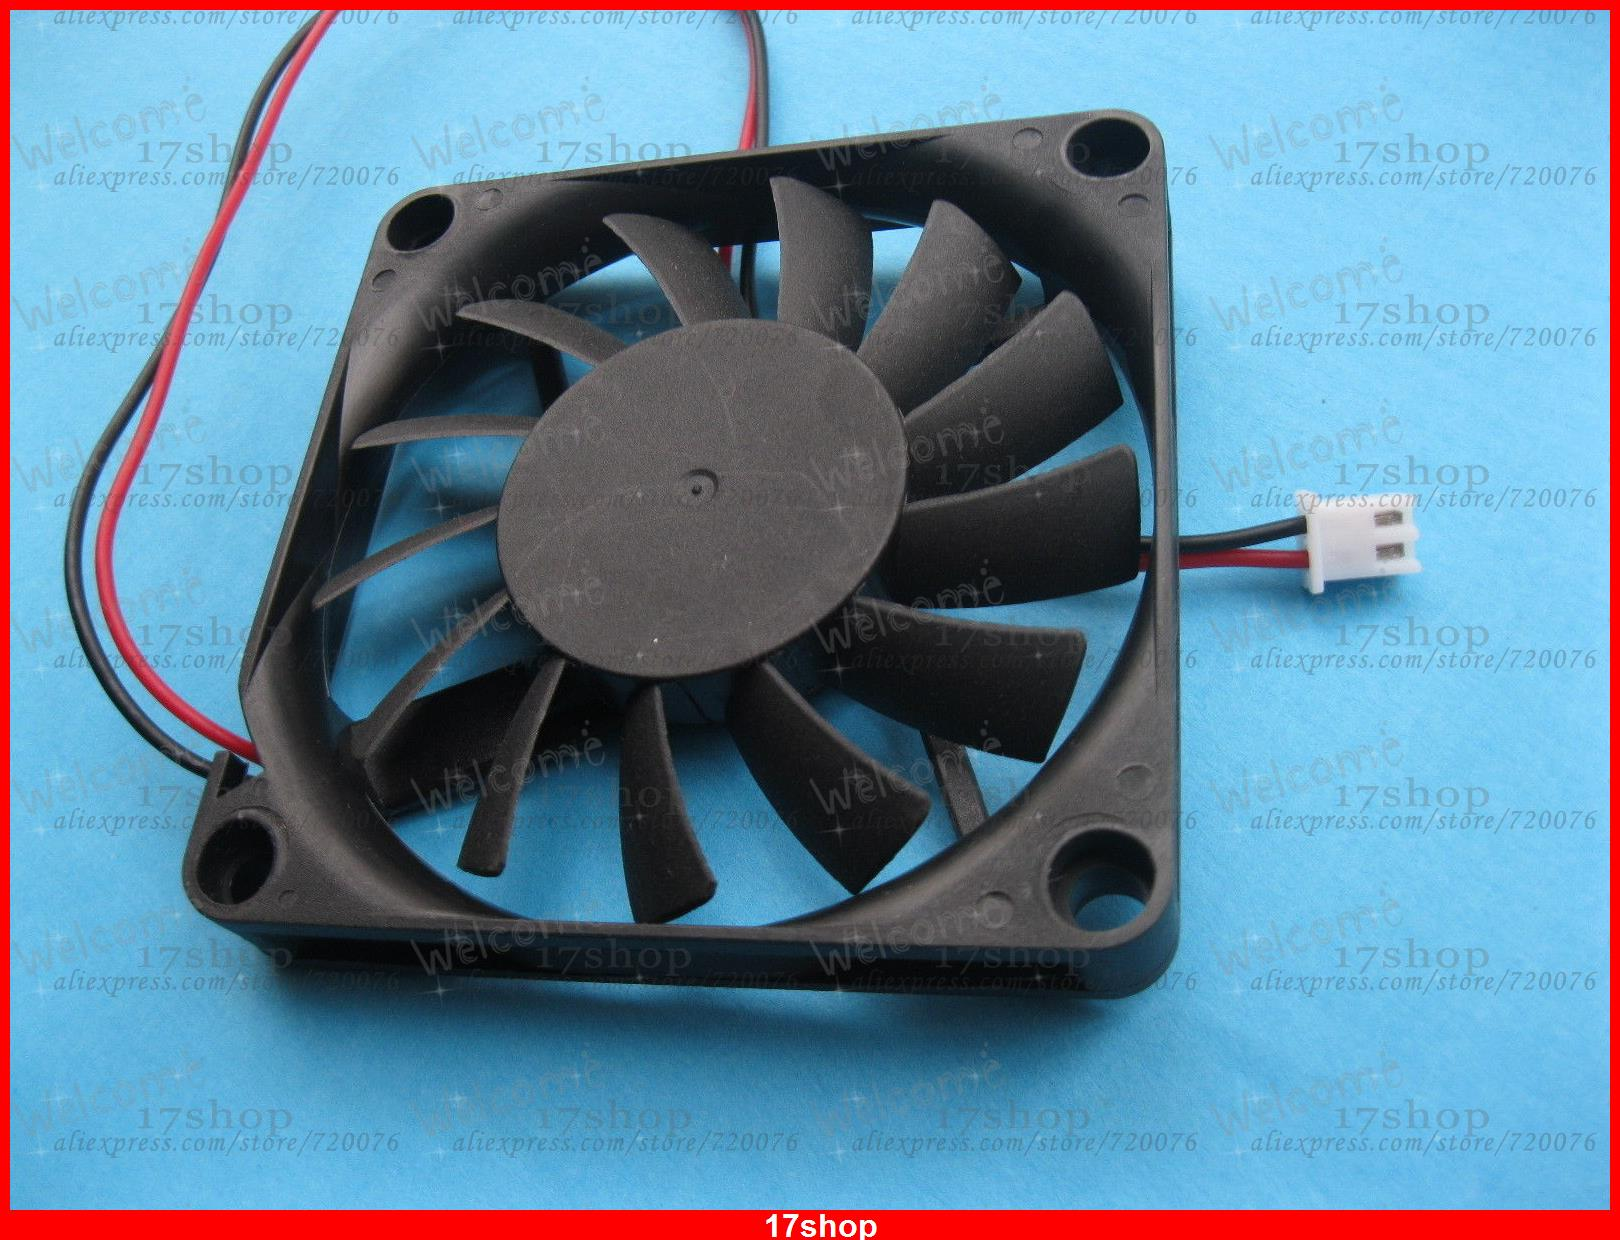 6 pcs Brushless DC Cooling Fan 5V 7010S 13 Blades 70x70x10mm 3 pin